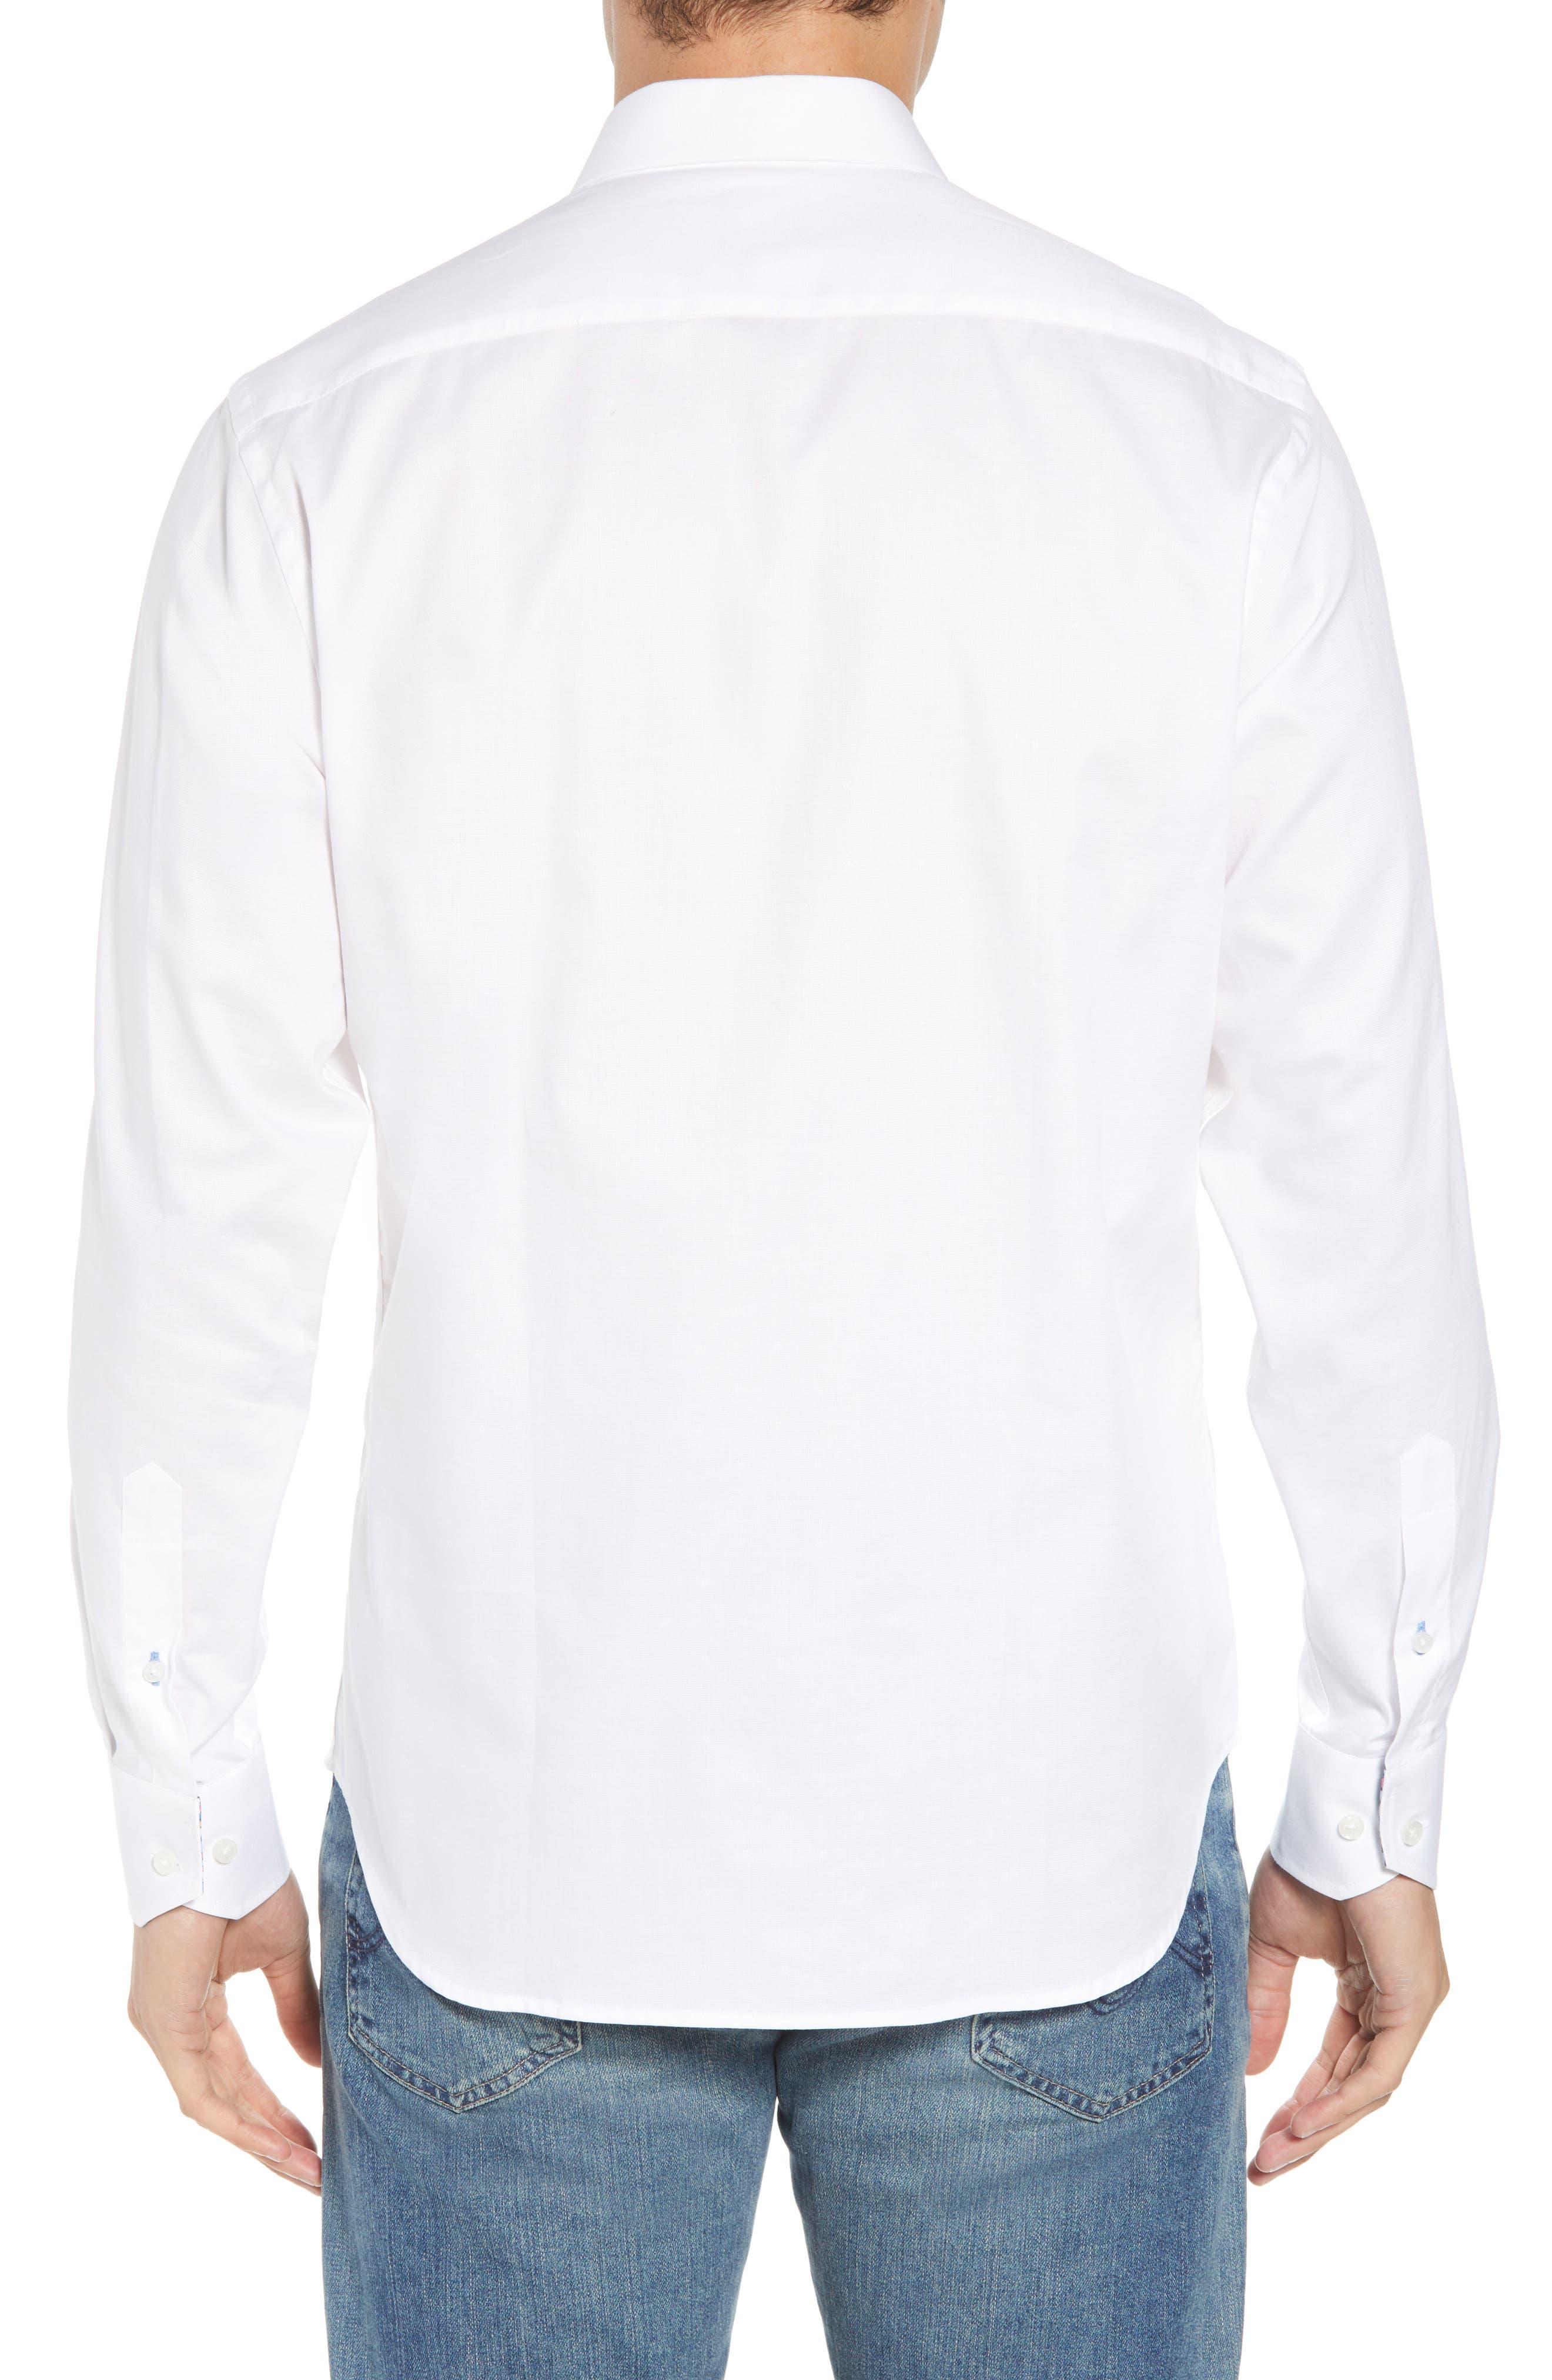 Baxley Regular Fit Sport Shirt,                             Alternate thumbnail 3, color,                             White